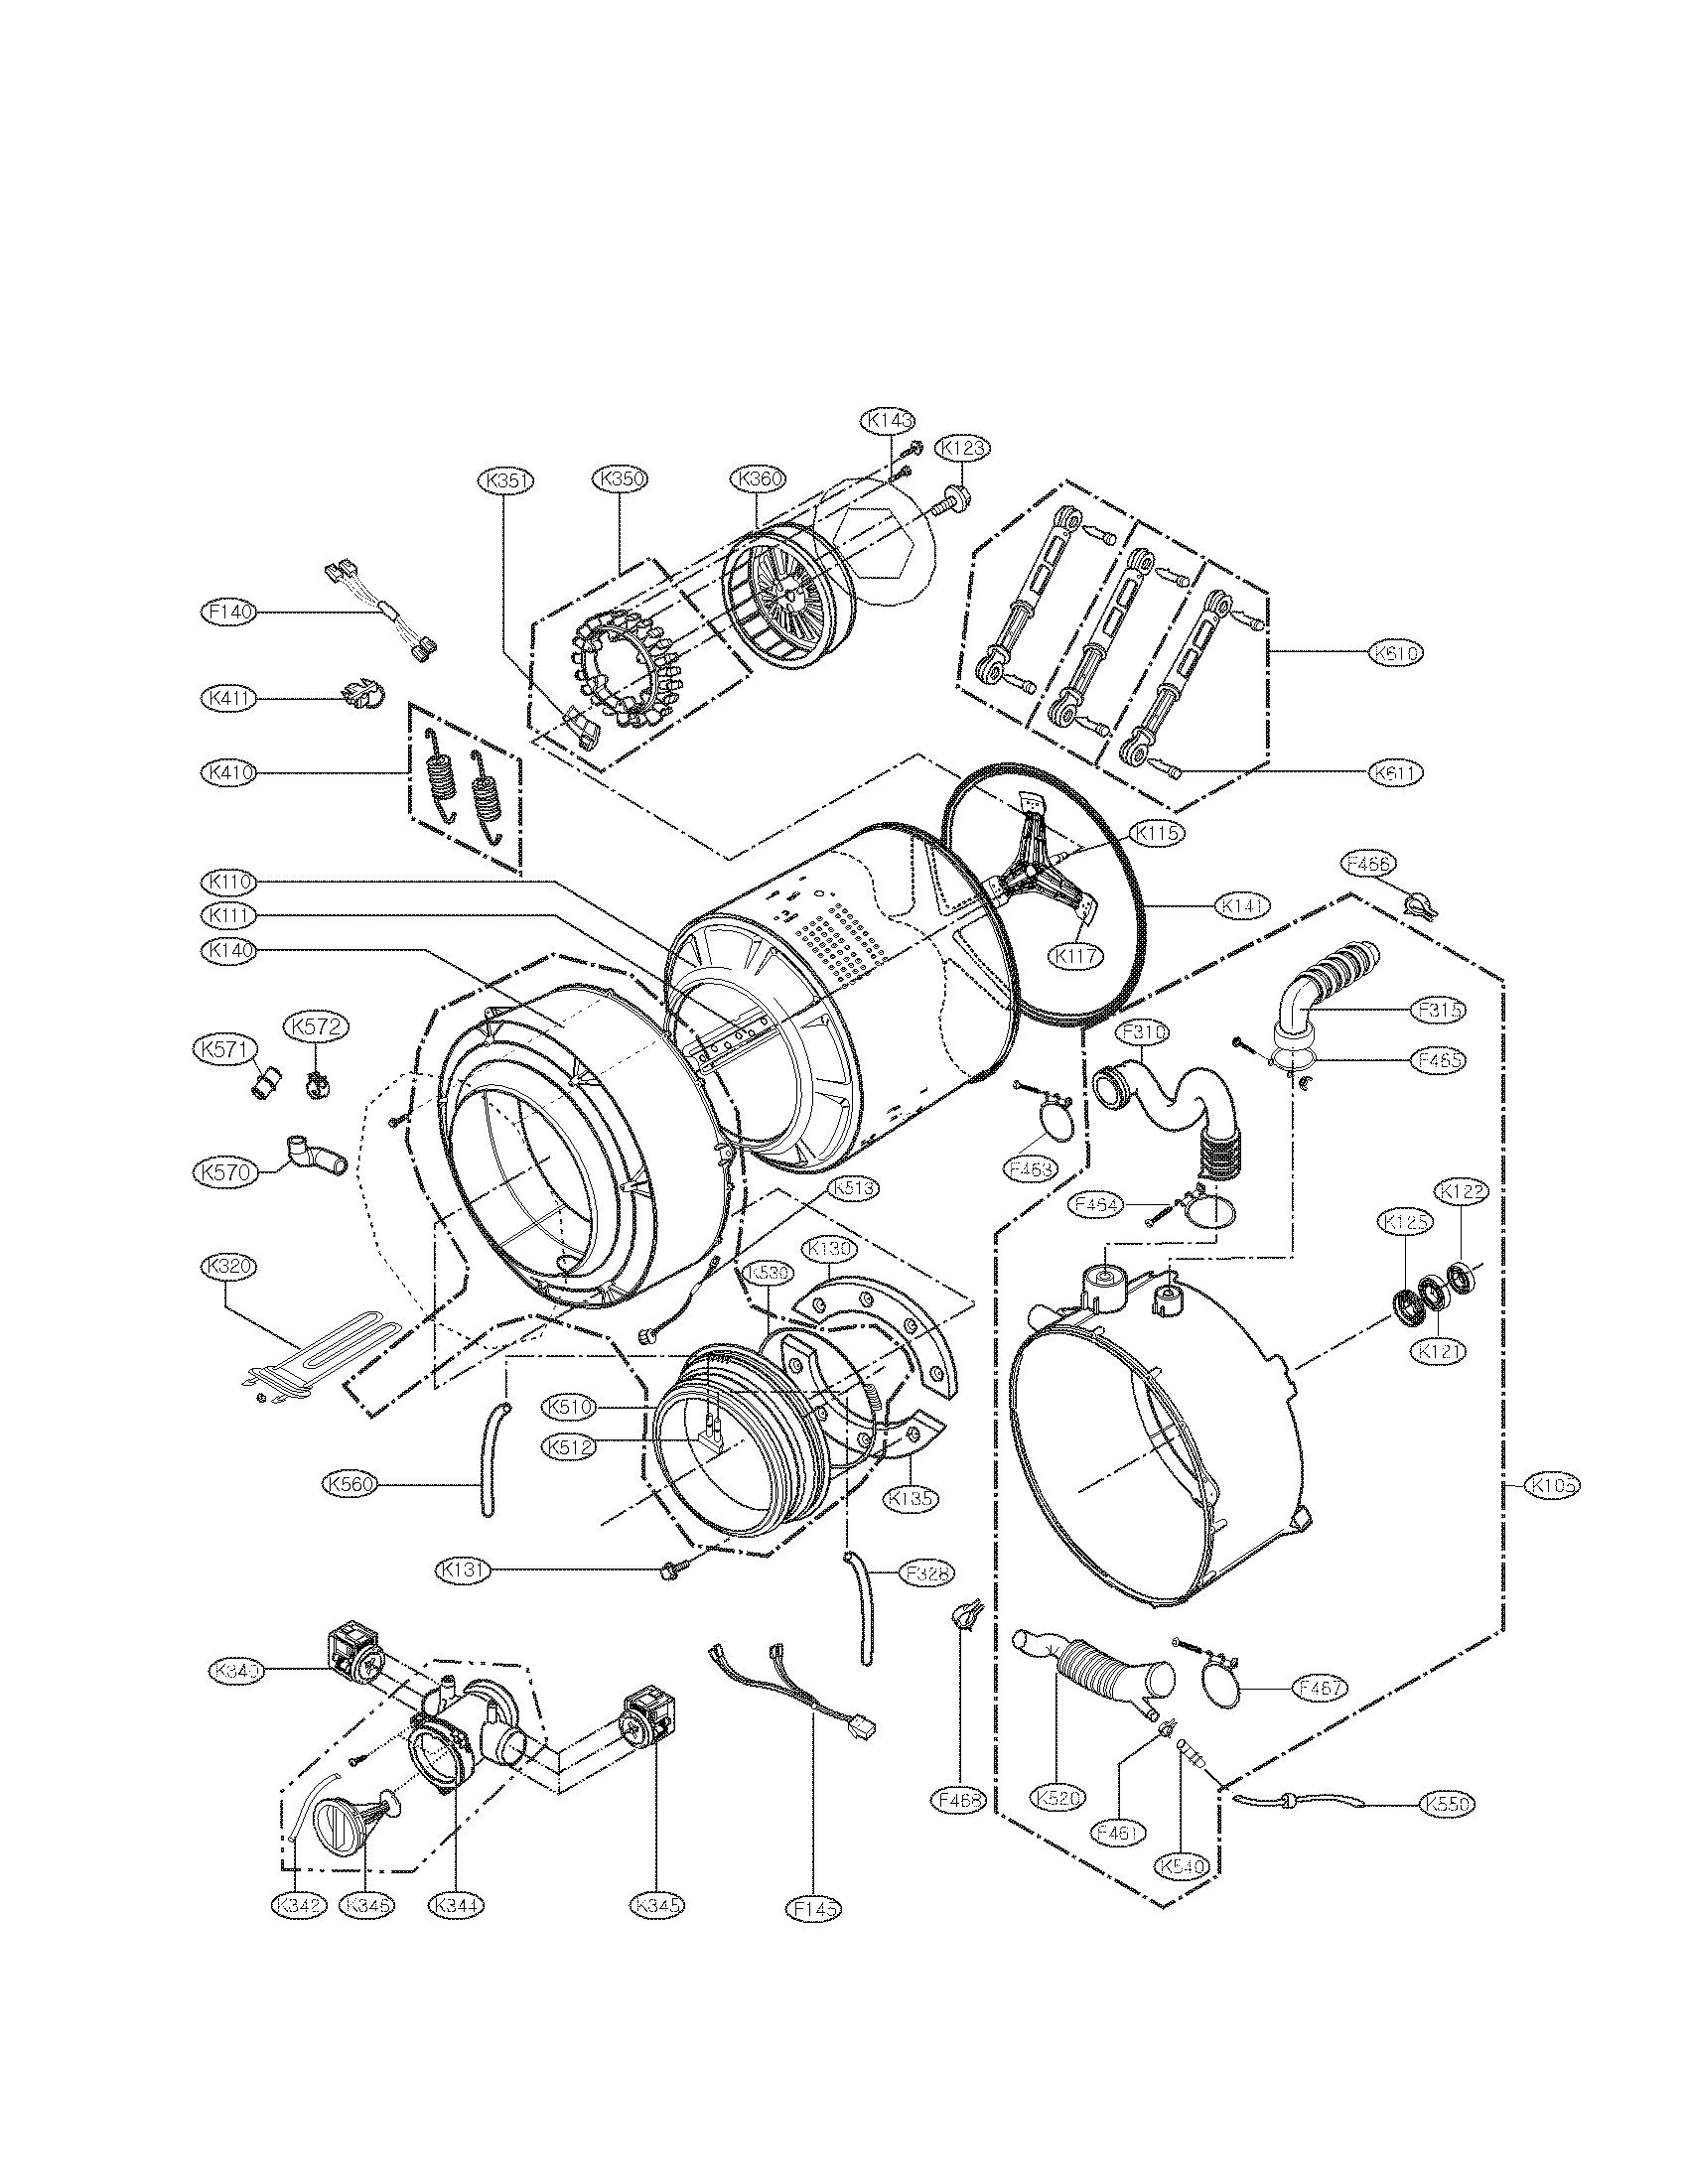 Lg model WM2487HRMA residential washers genuine parts